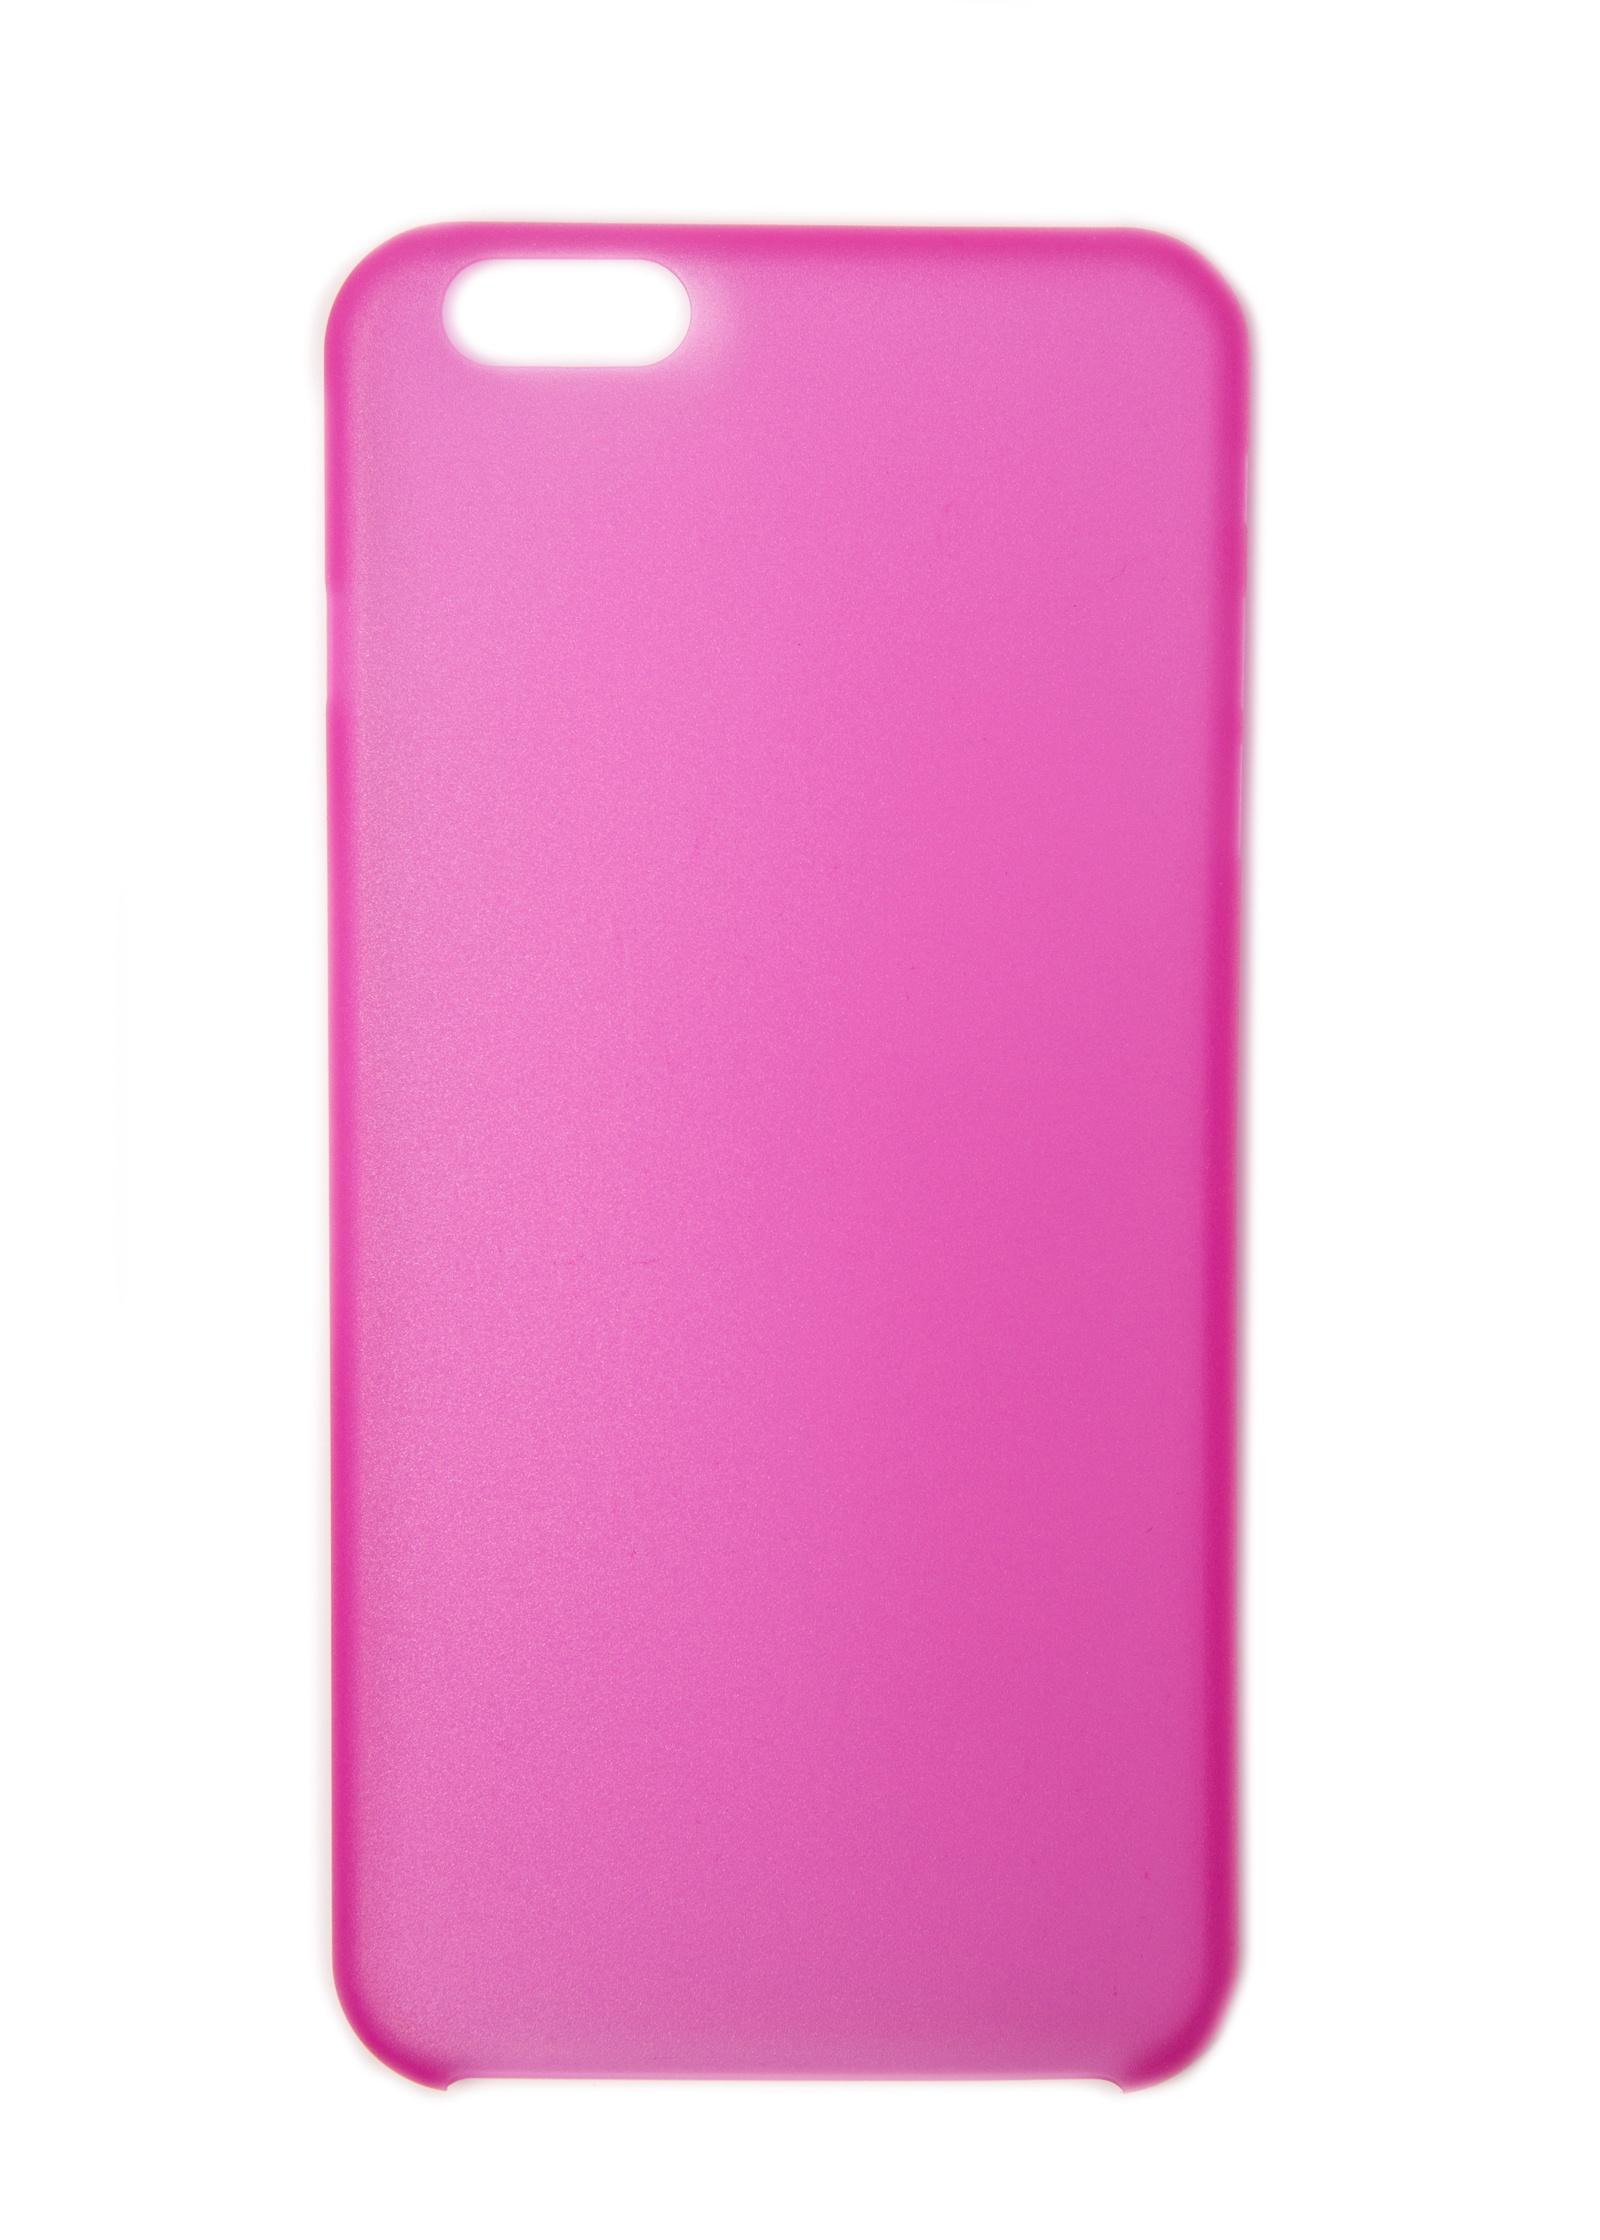 Чехол для сотового телефона Mitya Veselkov CASE, IP6.МITYA-234PVC все цены